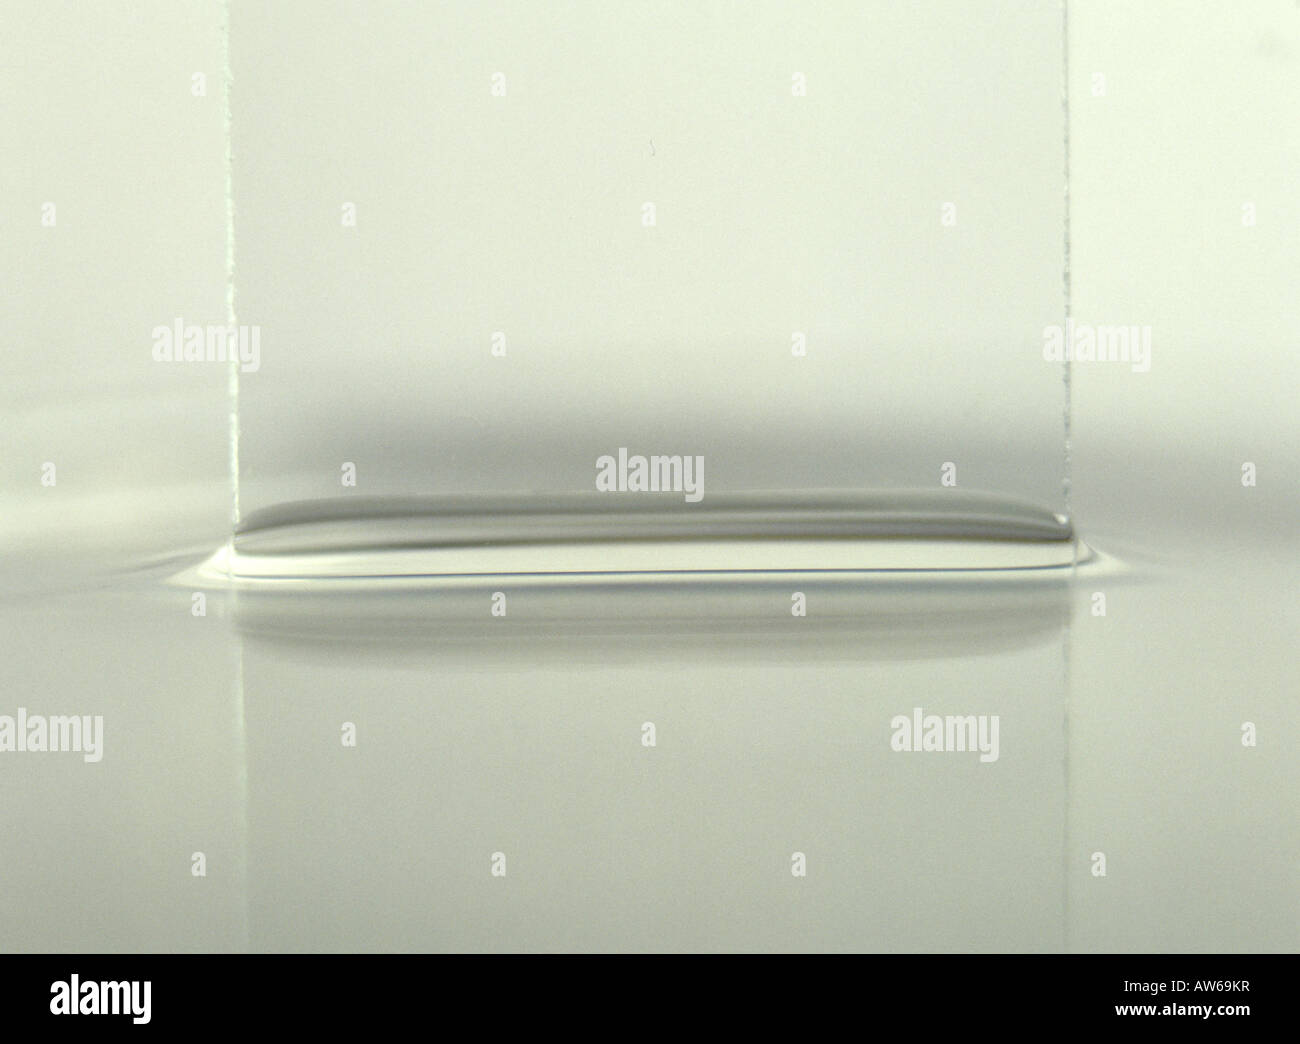 Ascenso capilar de agua sobre un portaobjetos de vidrio Imagen De Stock